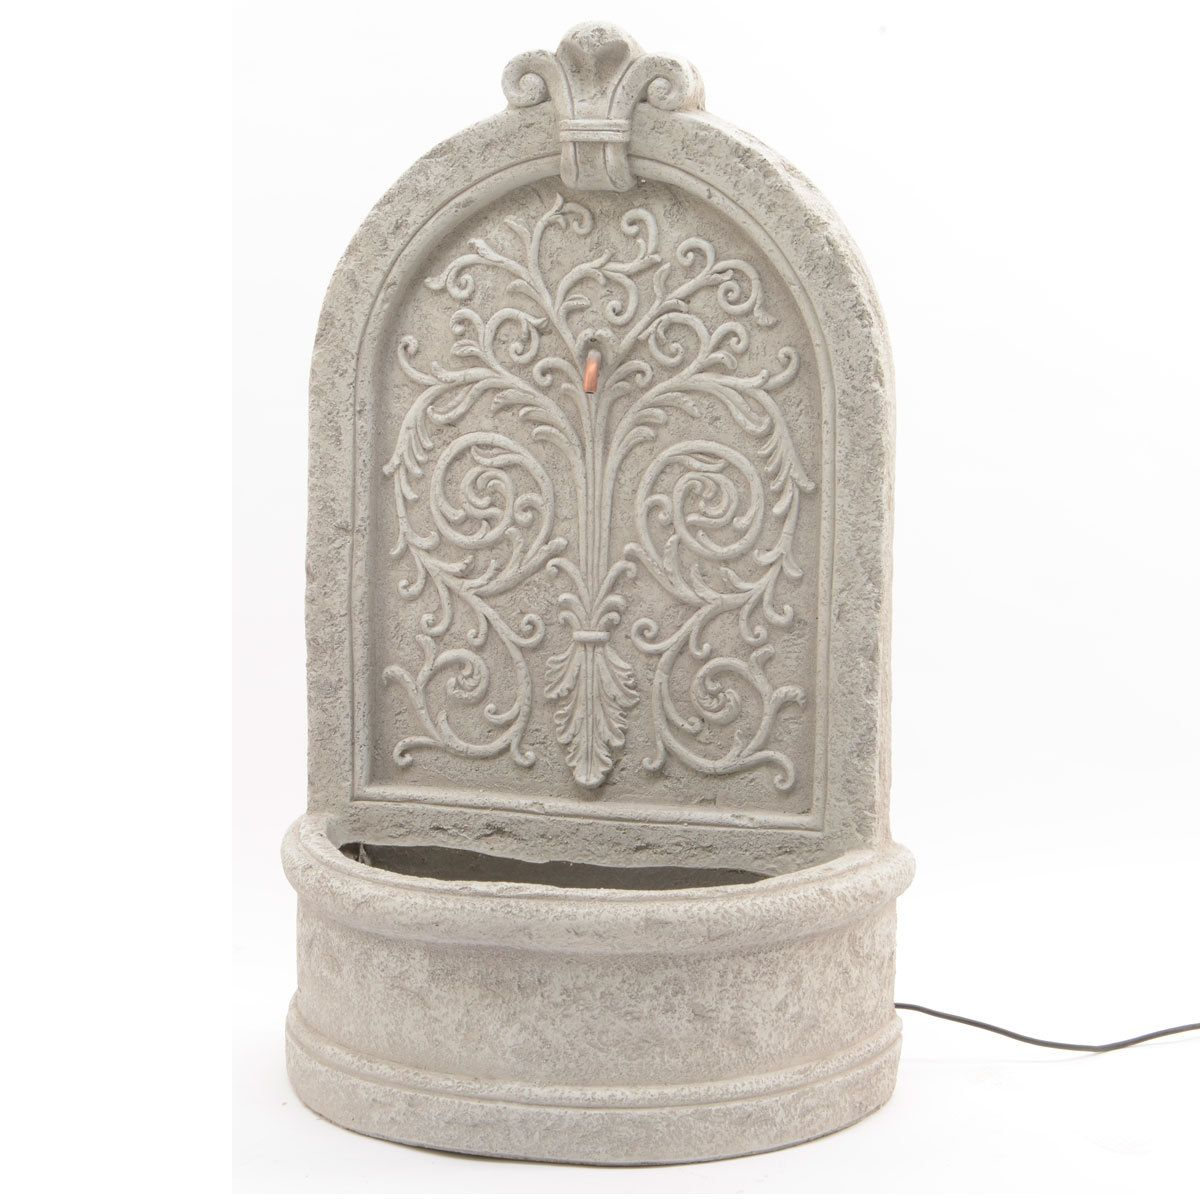 fontaine murale de jardin - Recherche Google | fontaine | Pinterest ...